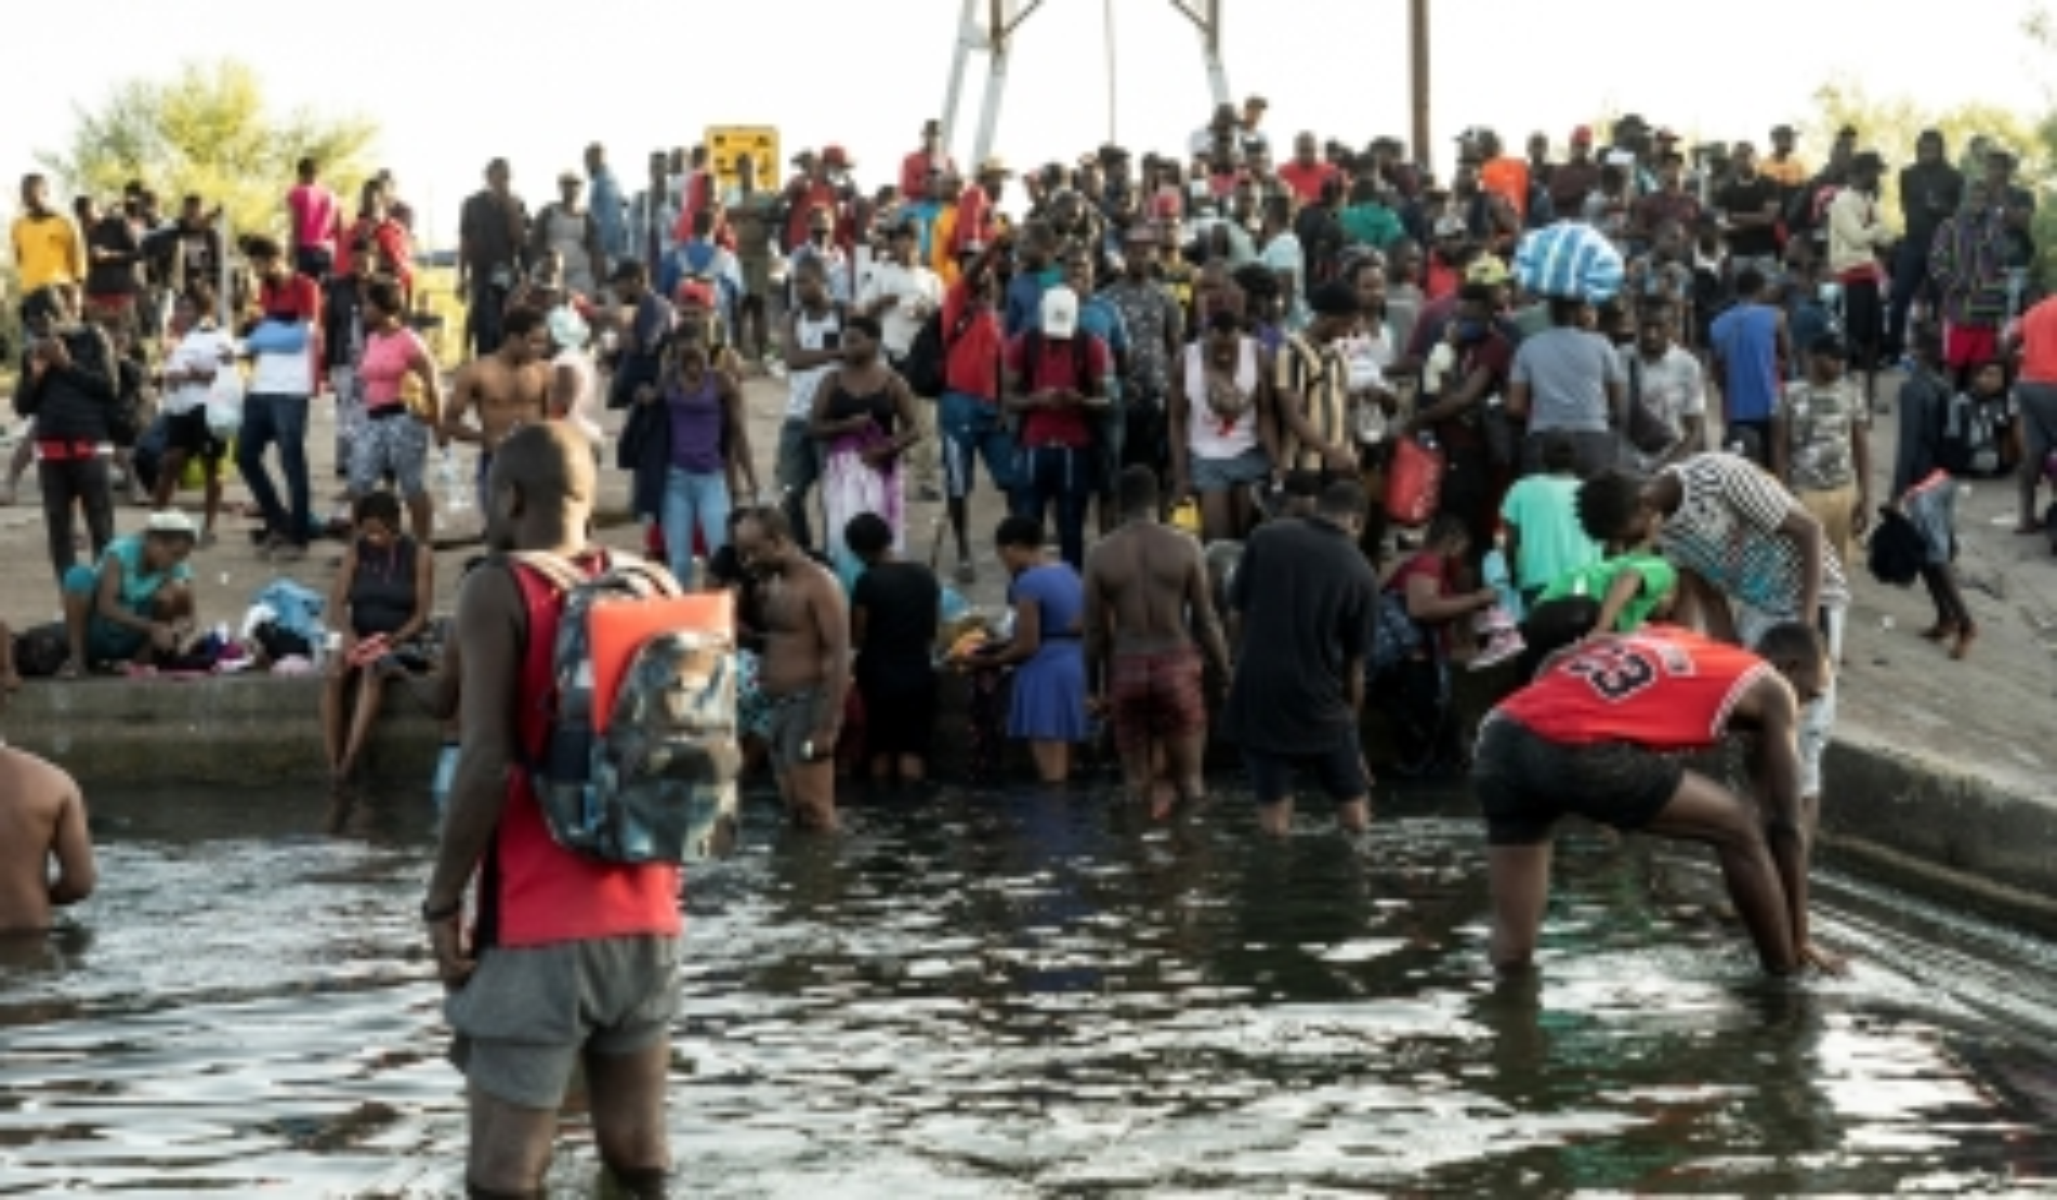 Mass of Migrants Crosses Rio Grande, Enters U.S. Illegally as Border Crisis Worsens